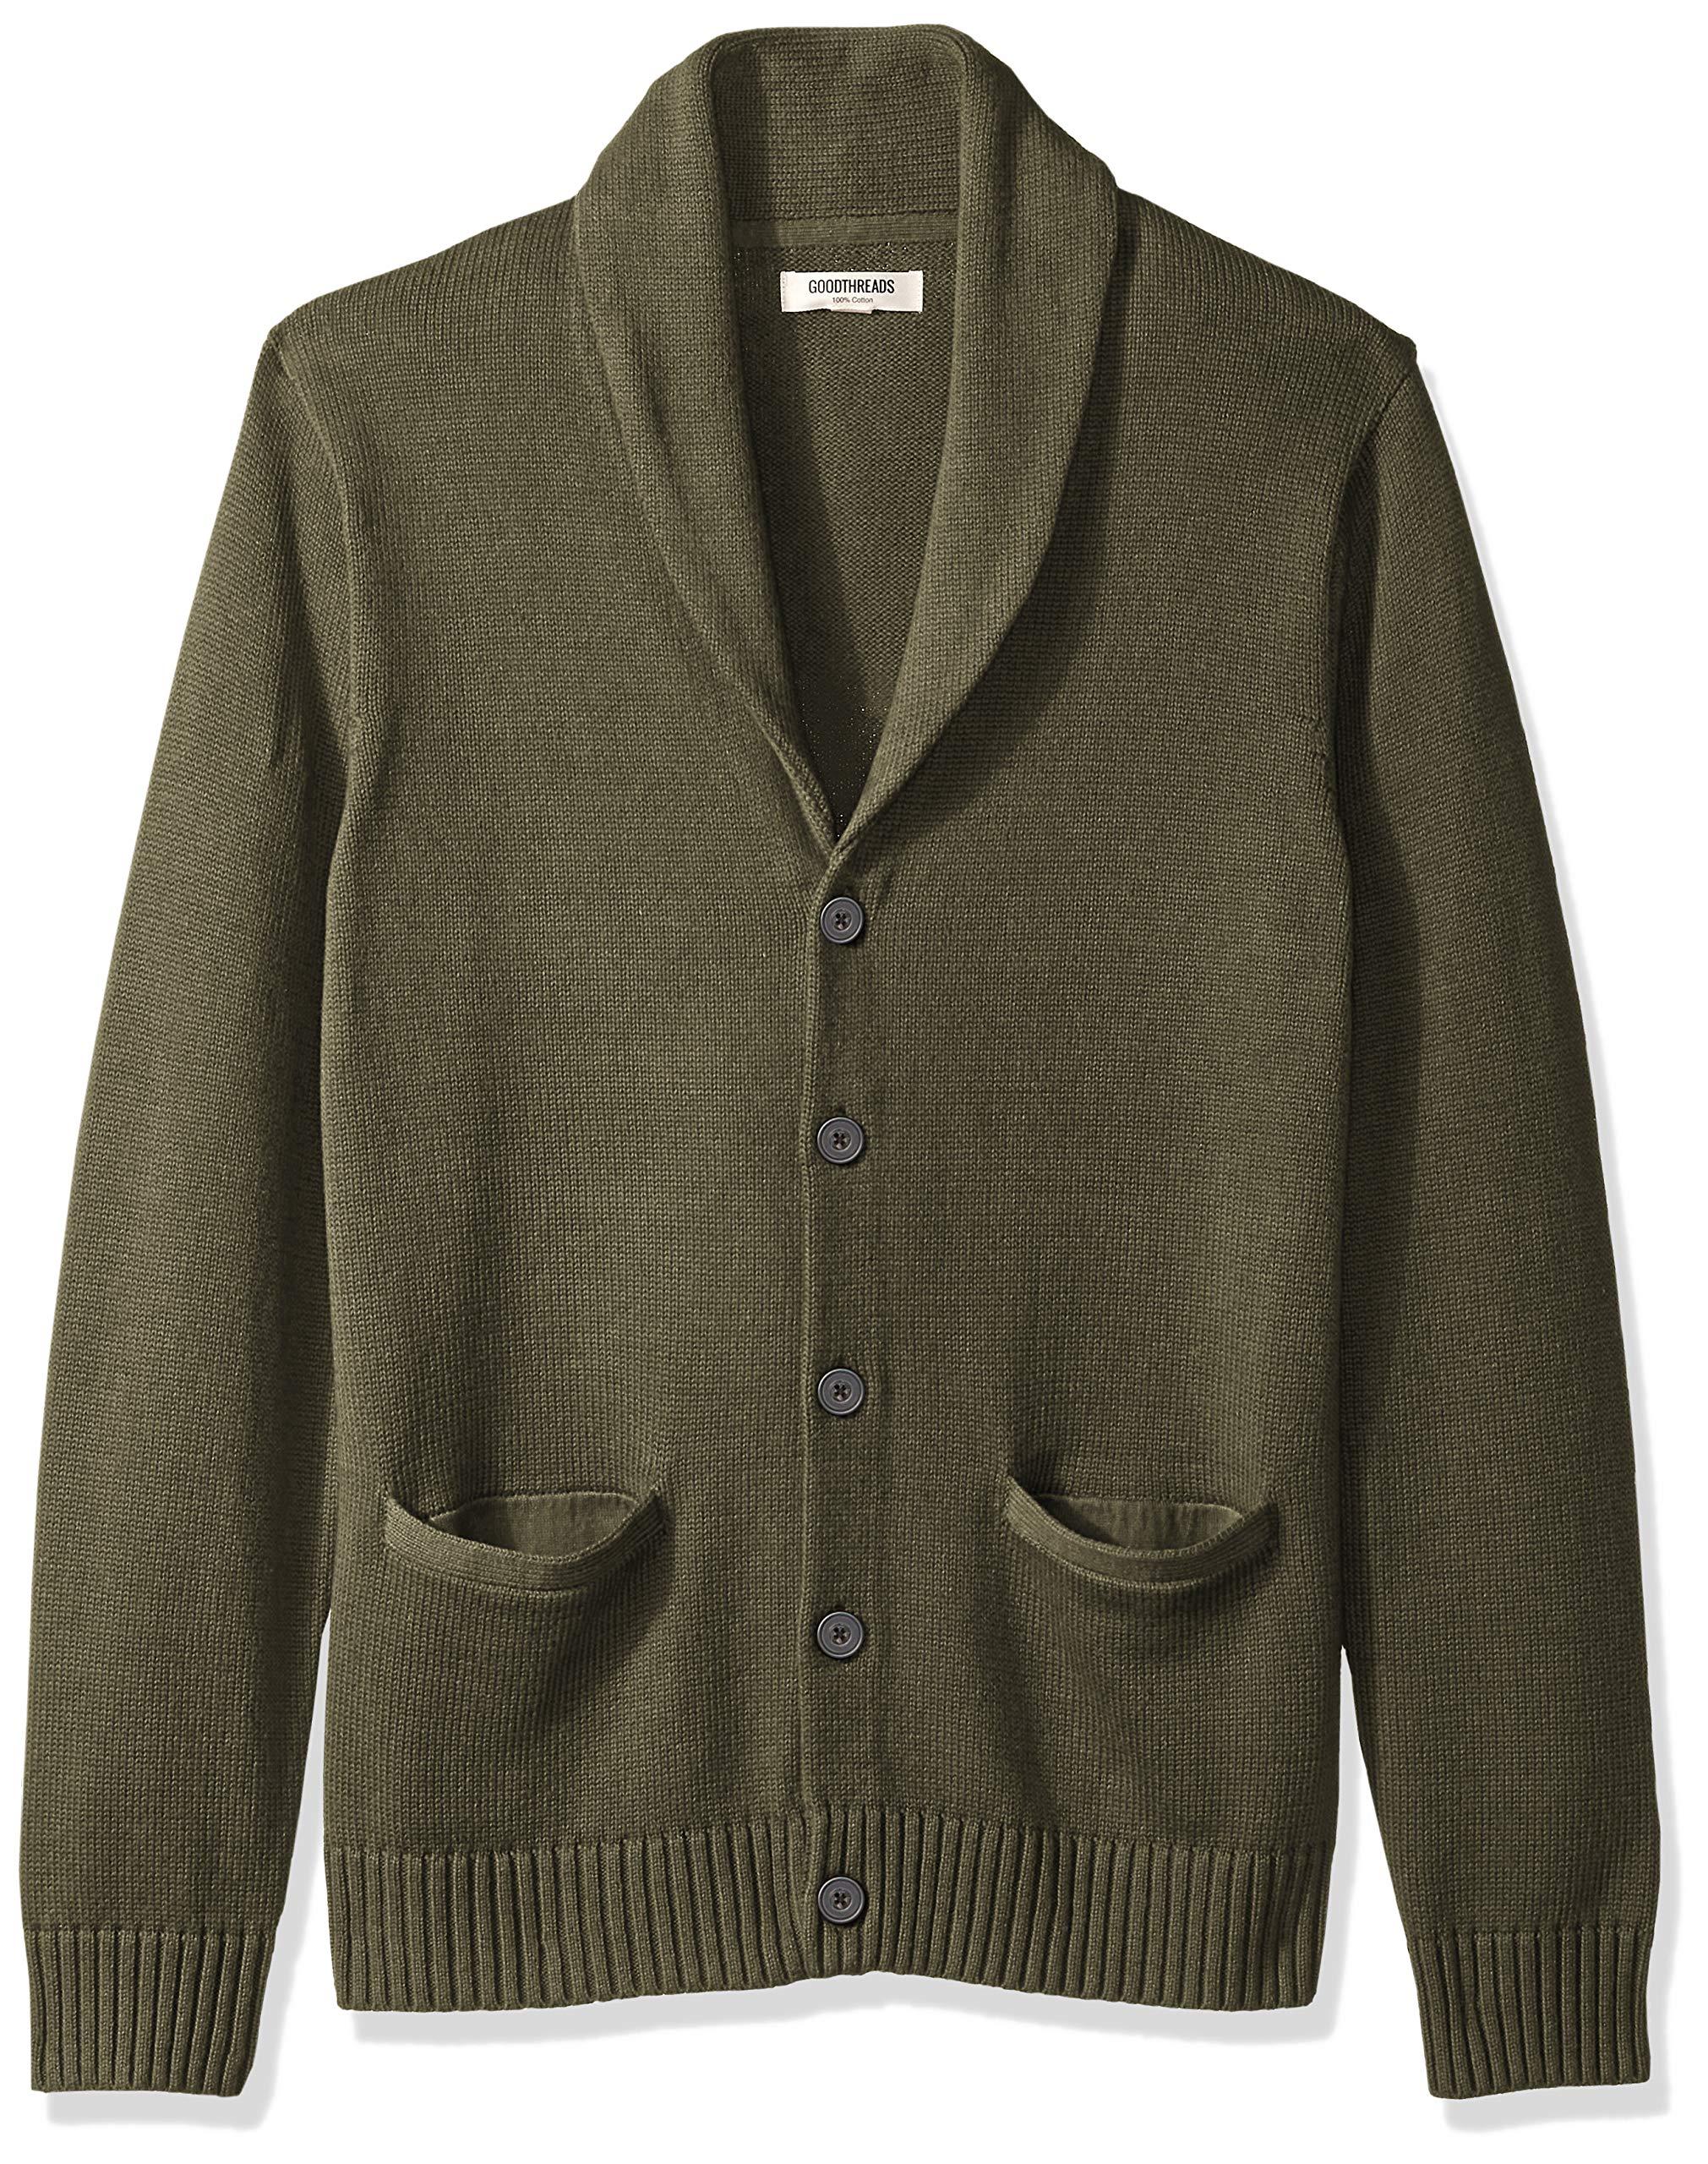 Amazon Brand – Goodthreads Men's Soft Cotton Shawl Cardigan Sweater